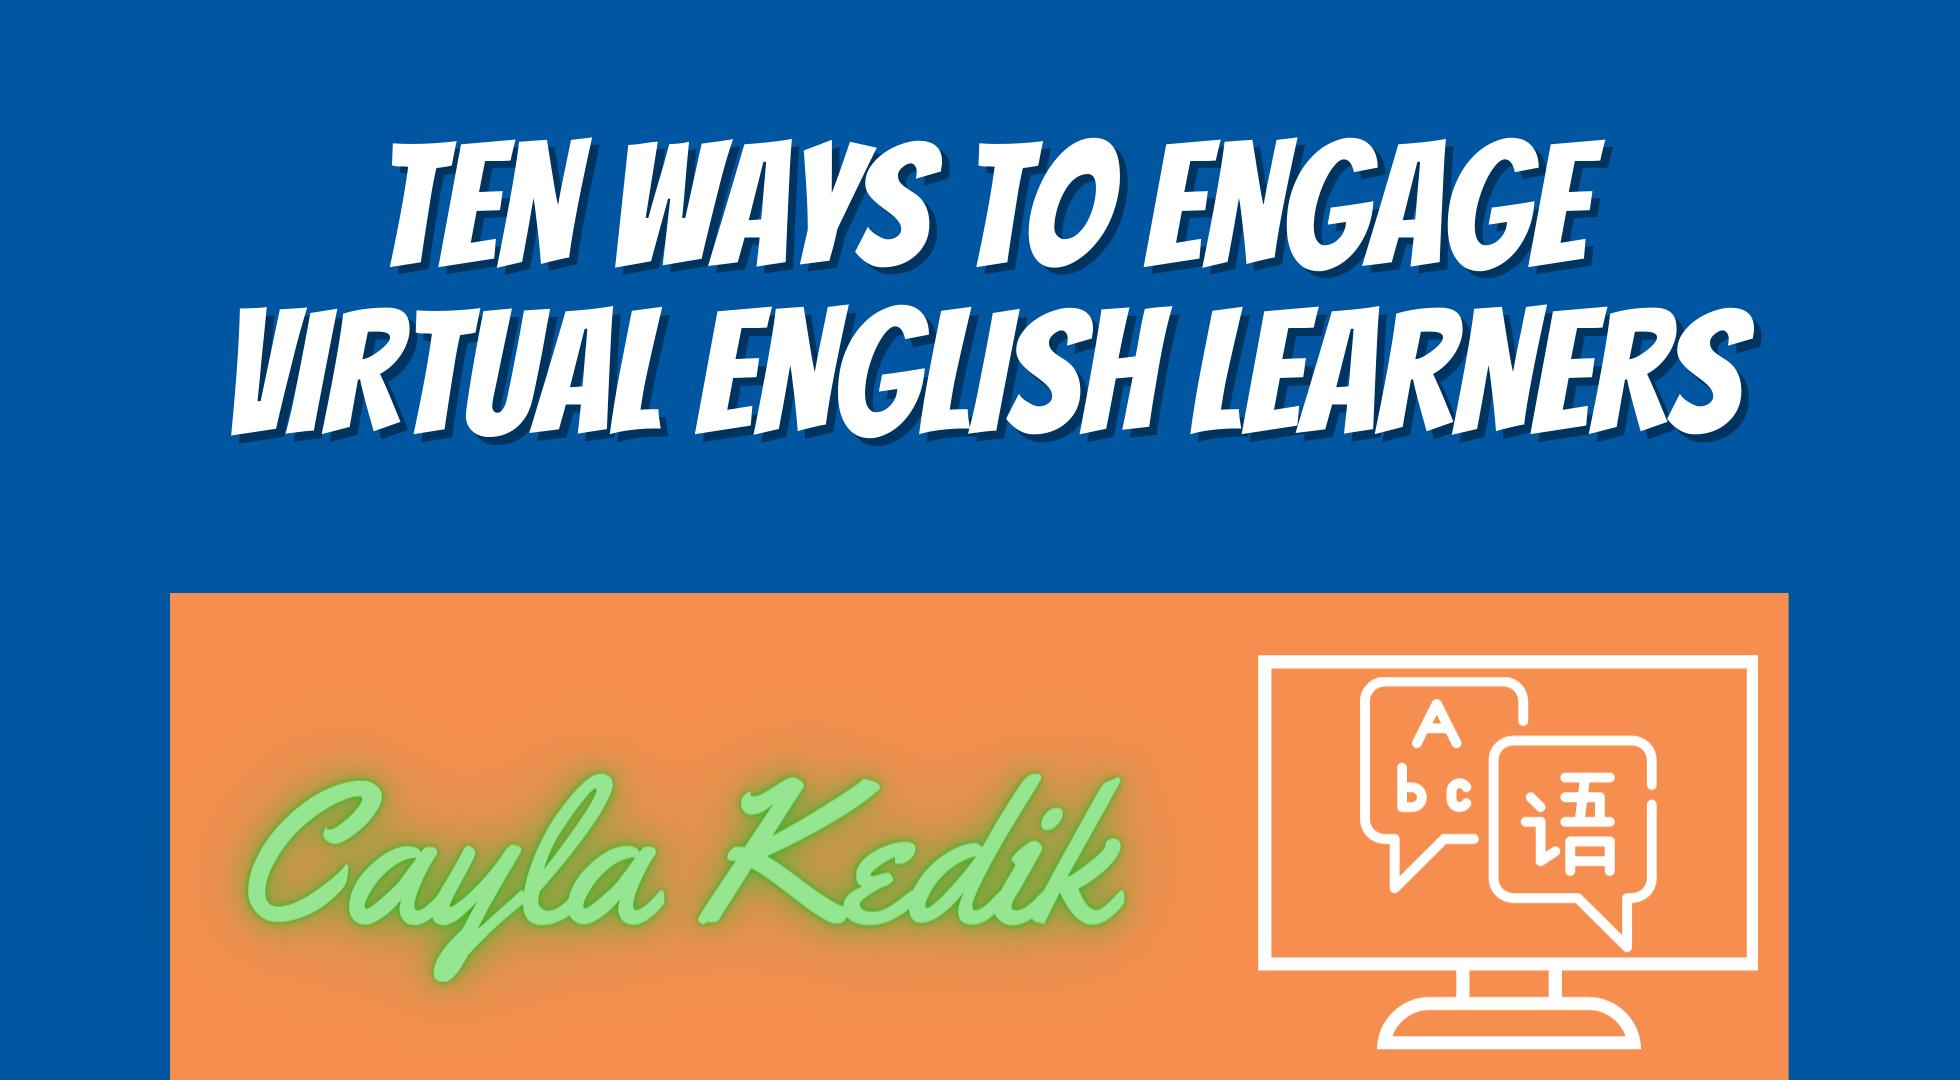 Ten Ways to Engage Virtual English Learners